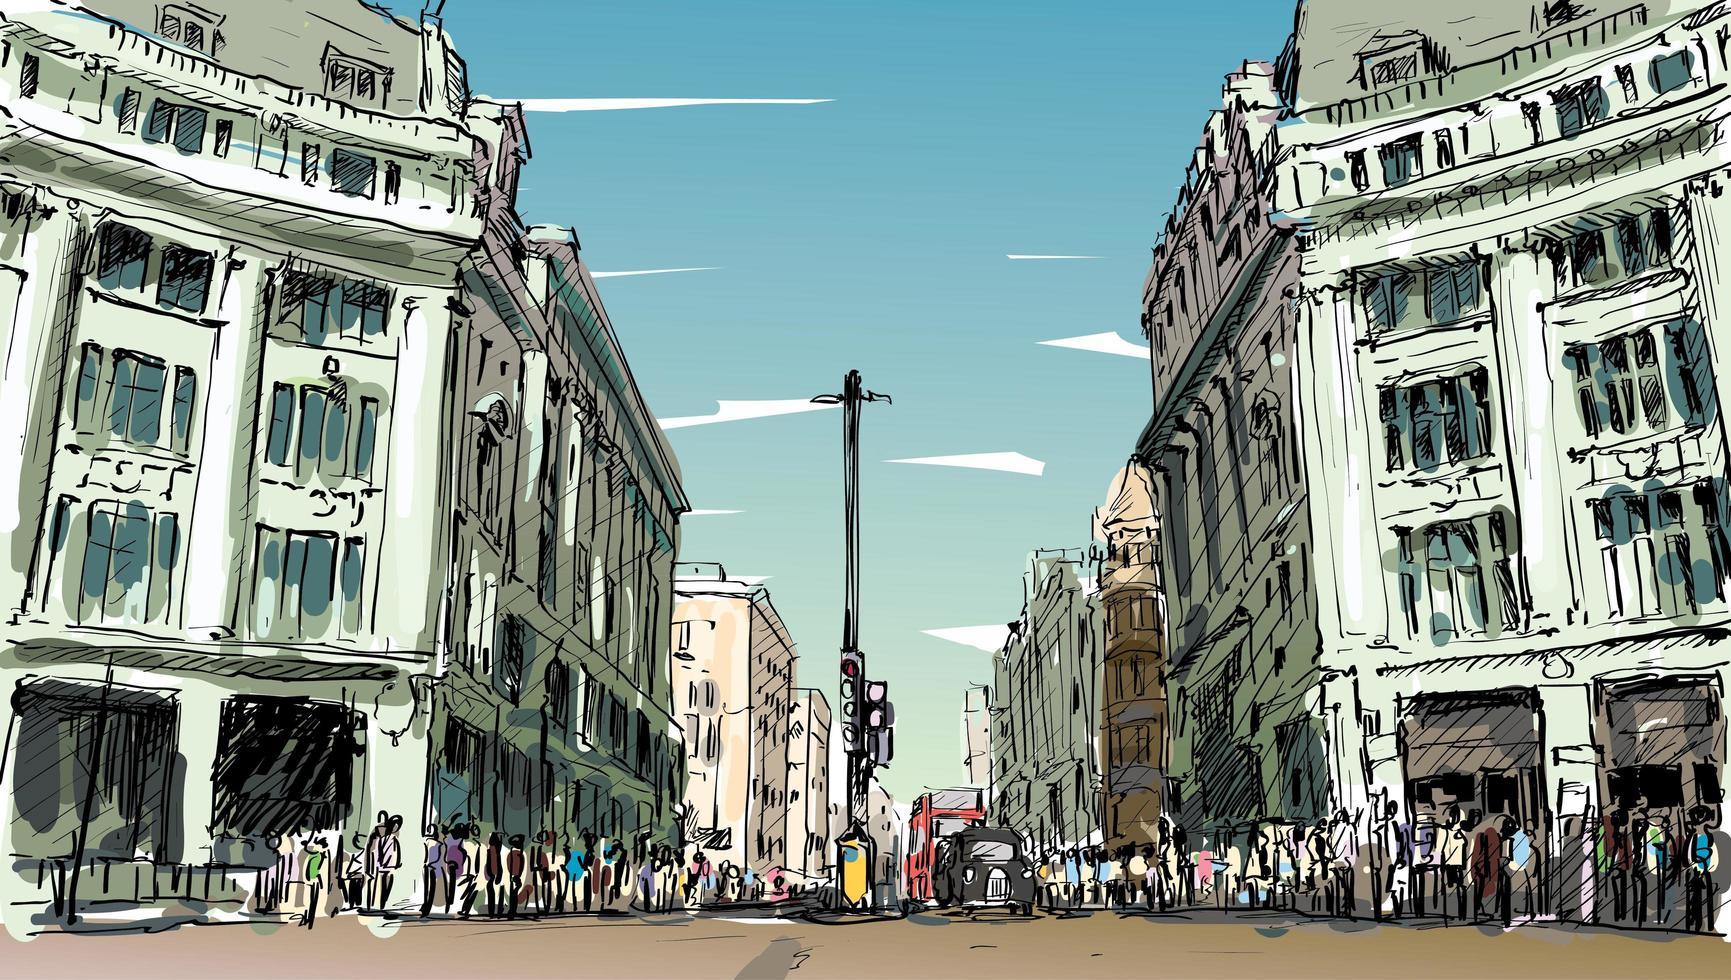 Boceto a color de un paisaje urbano en Inglaterra vector